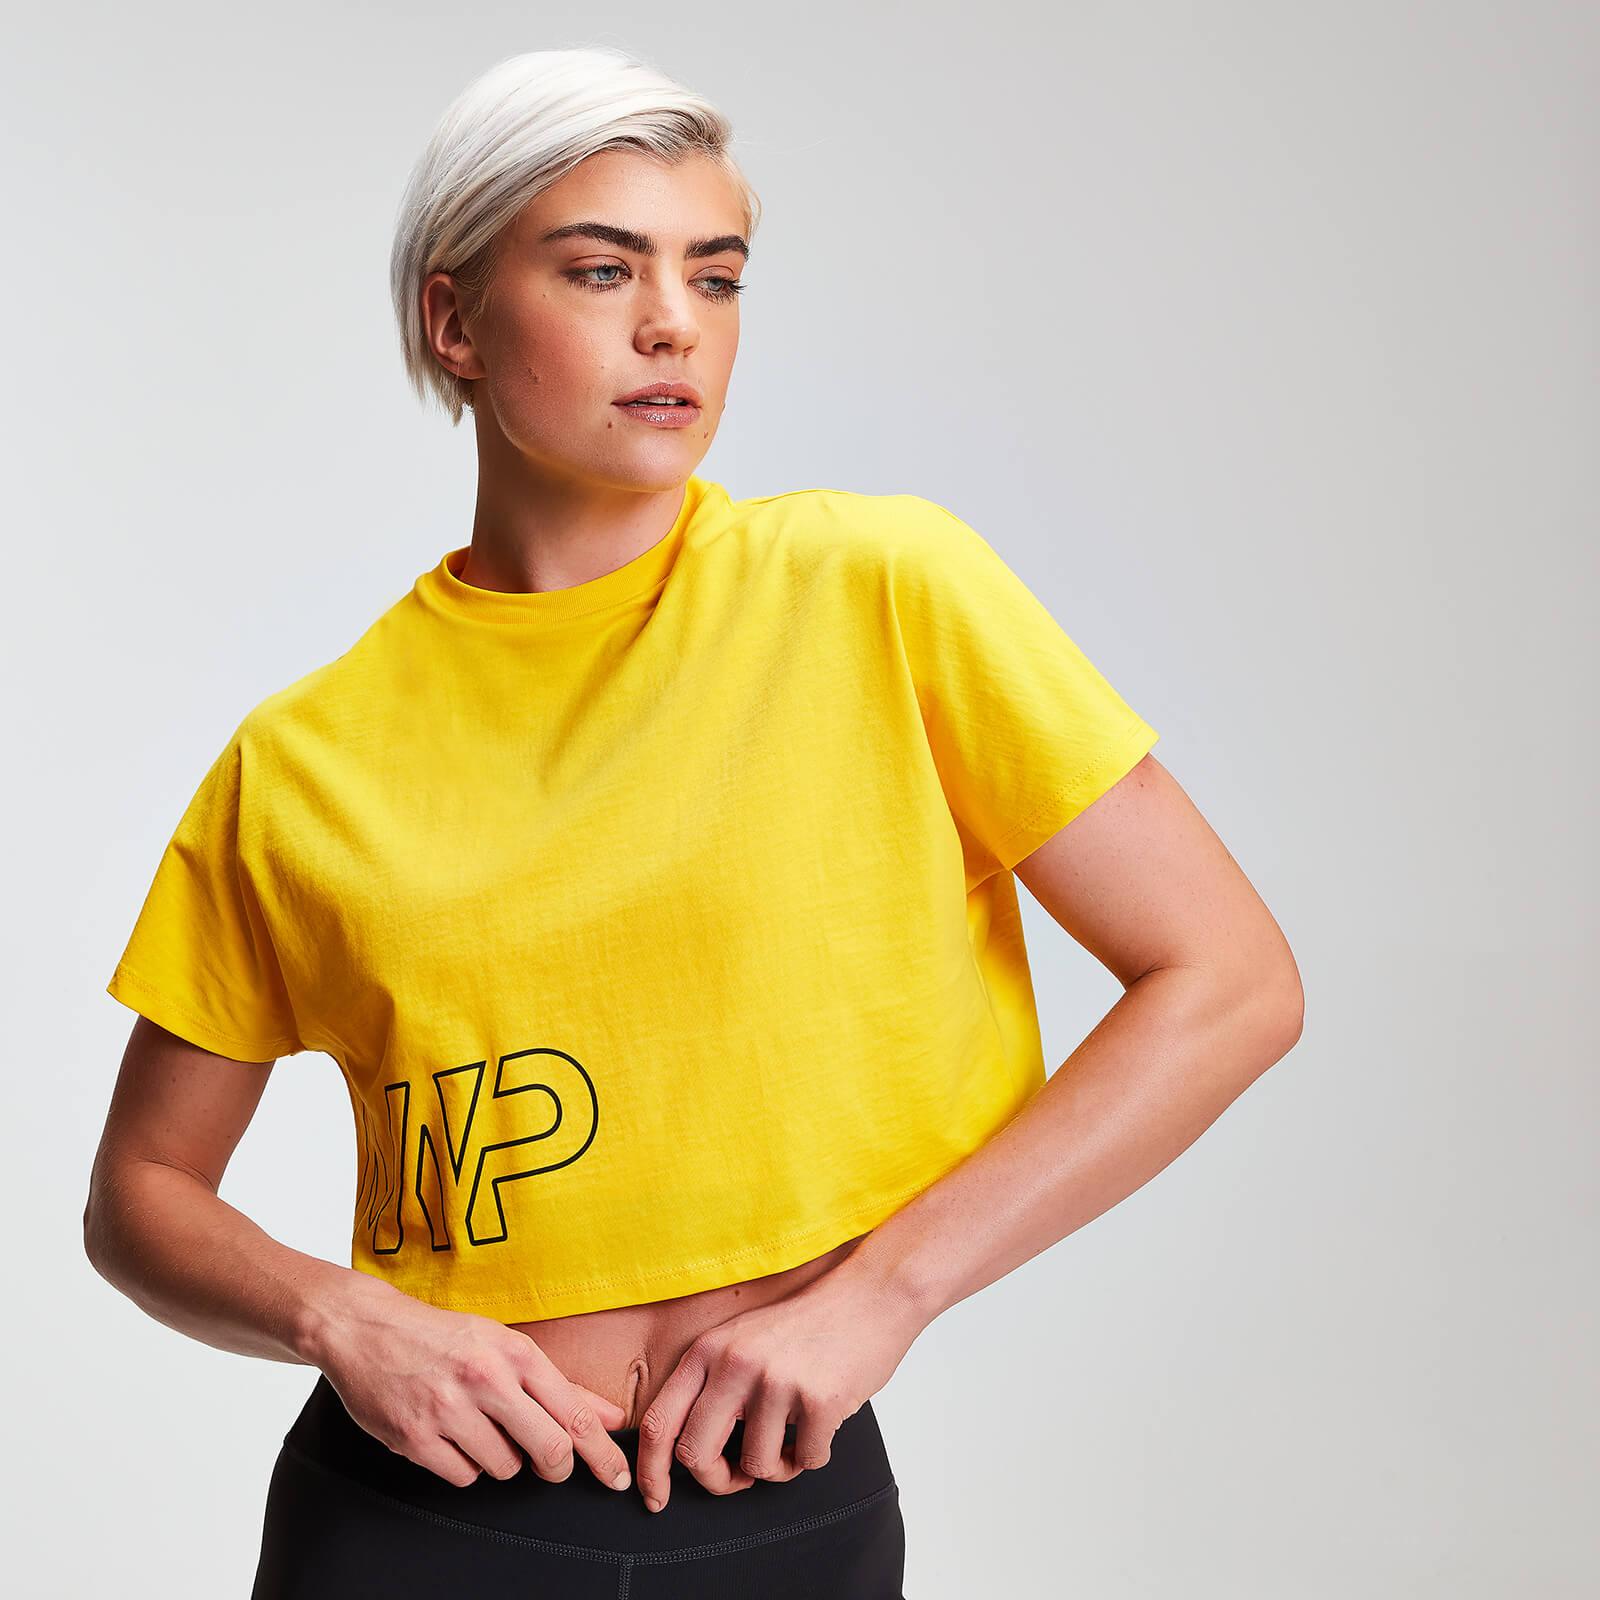 Myprotein Naisten MP Power Cropped T-Paita - Buttercup - L